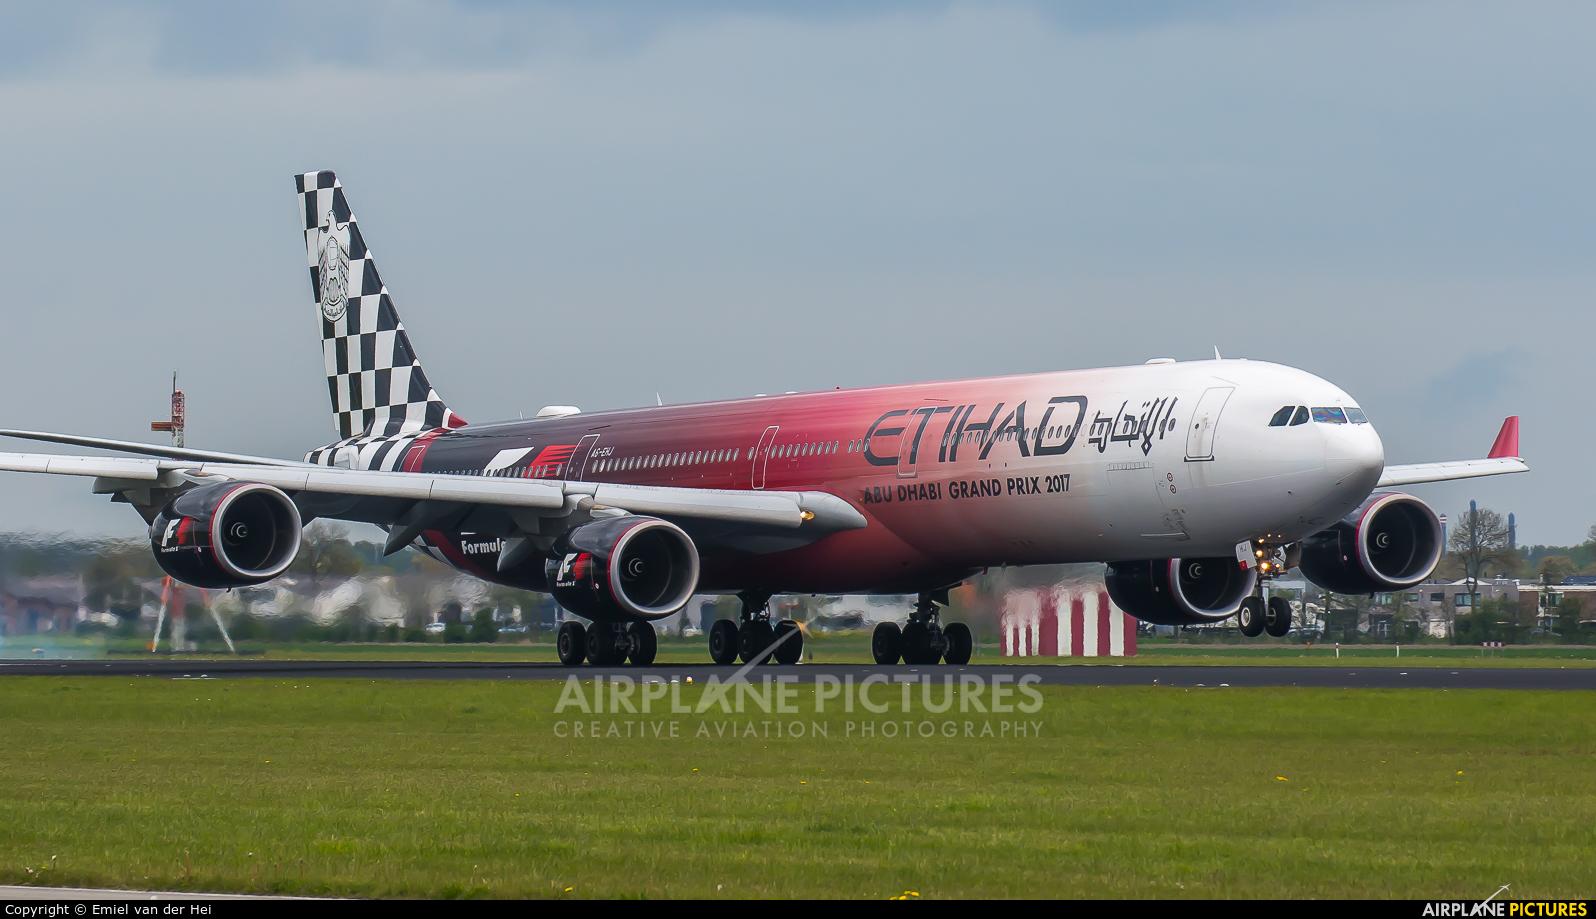 Etihad Airways A6-EHJ aircraft at Amsterdam - Schiphol